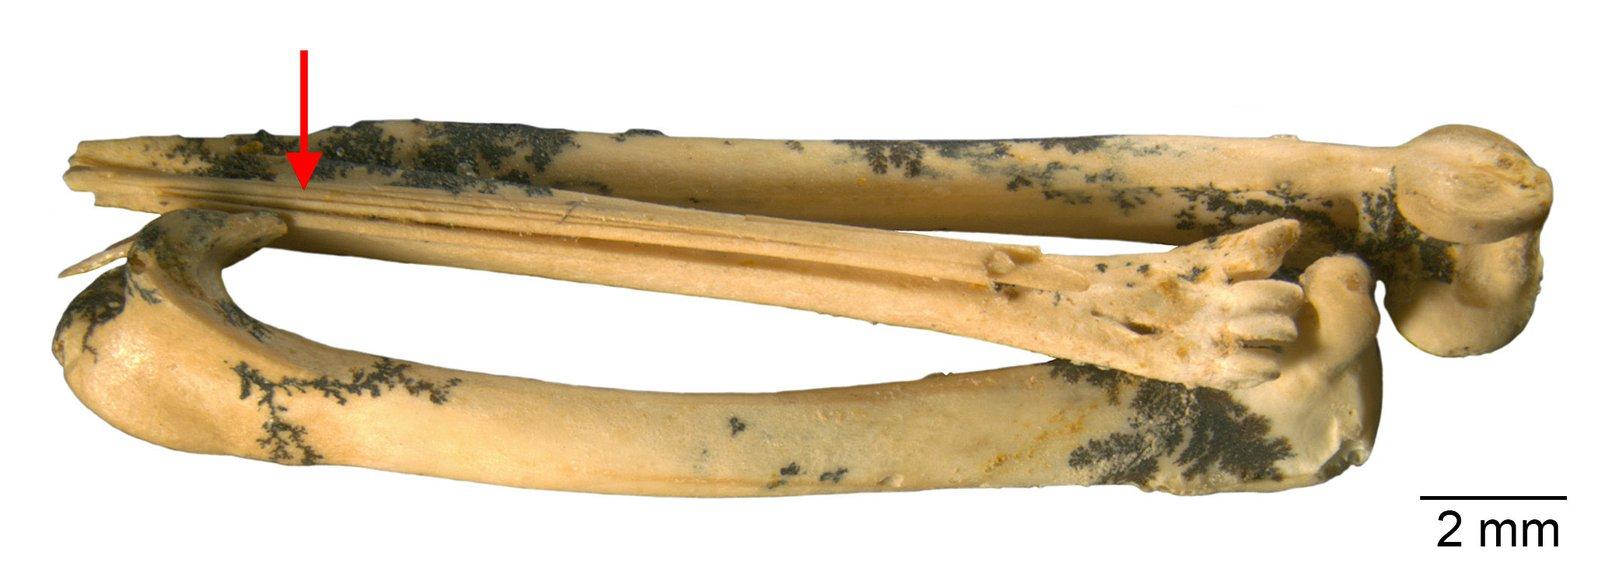 The fossil leg bones of the extinct Walter's Bristlebird Dasyornis walterbolesi